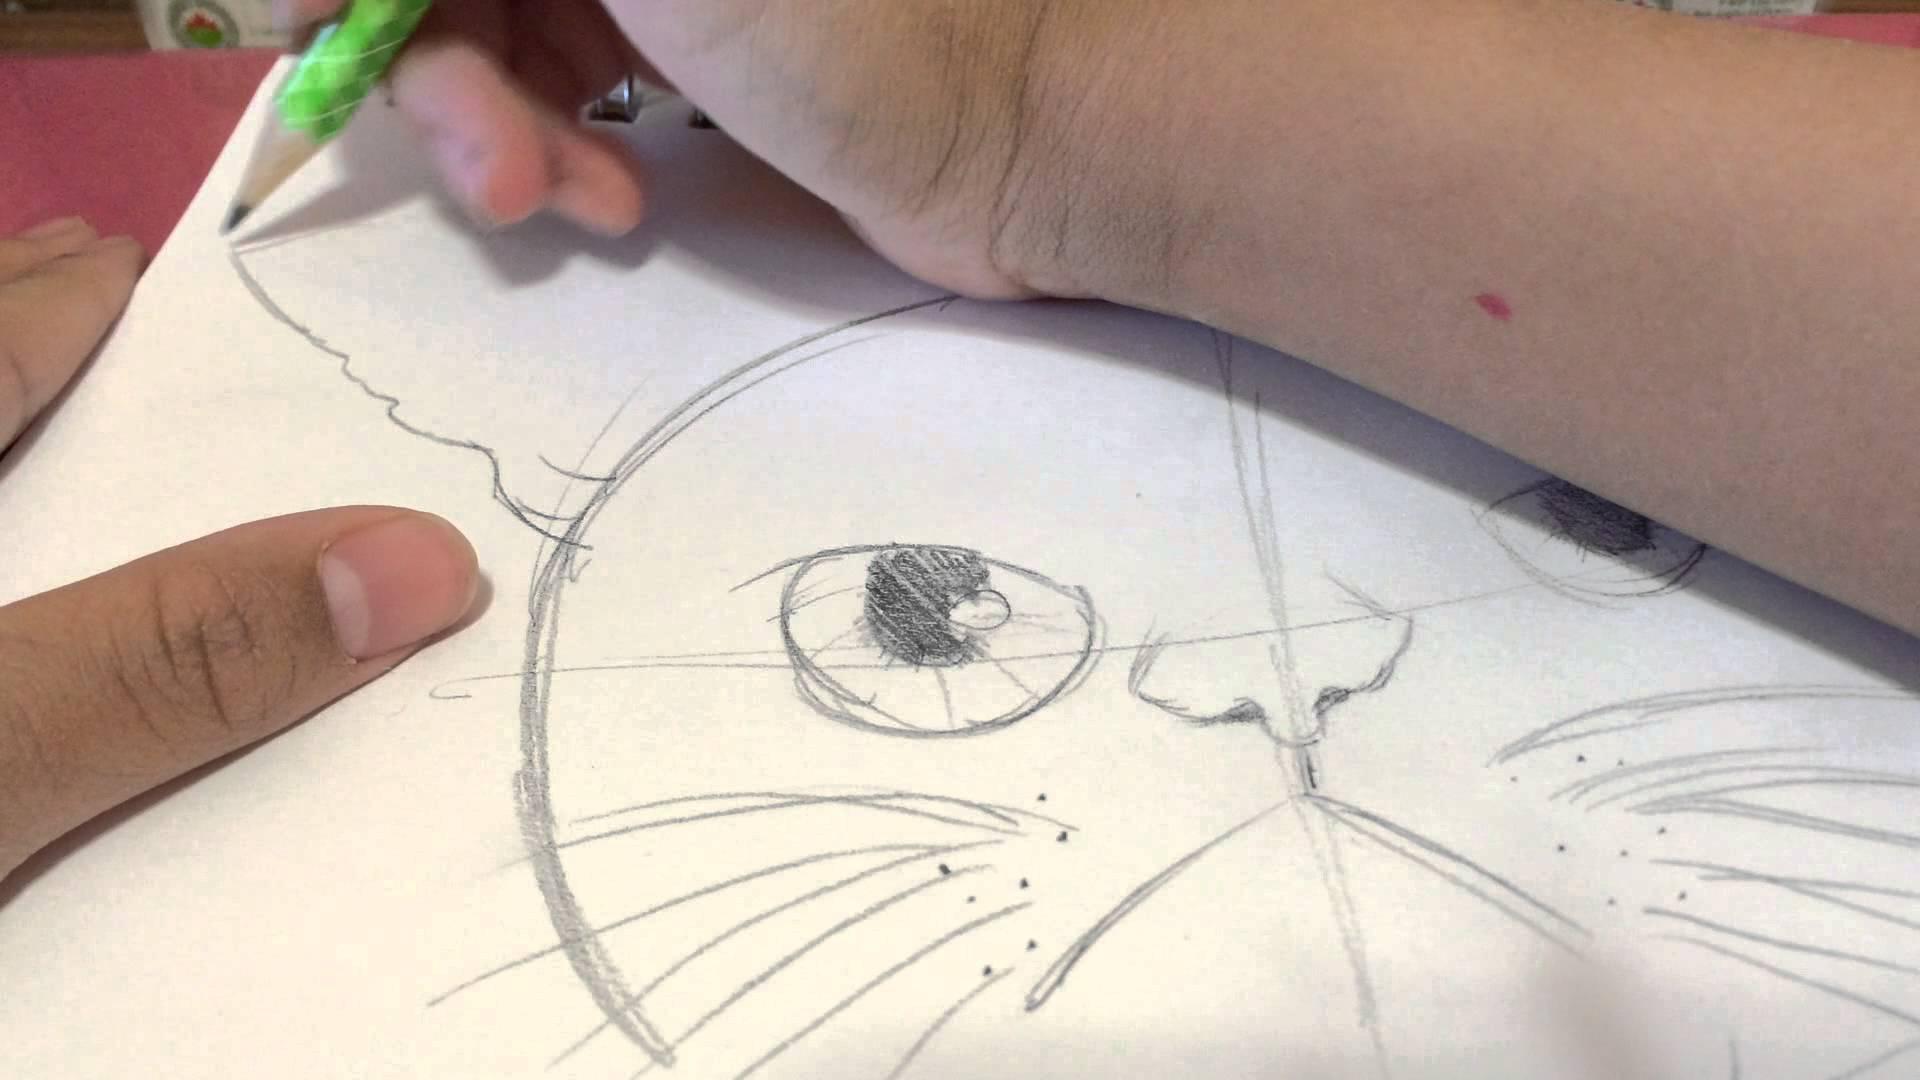 Drawn grumpy cat polymer clay To How cat grumpy draw